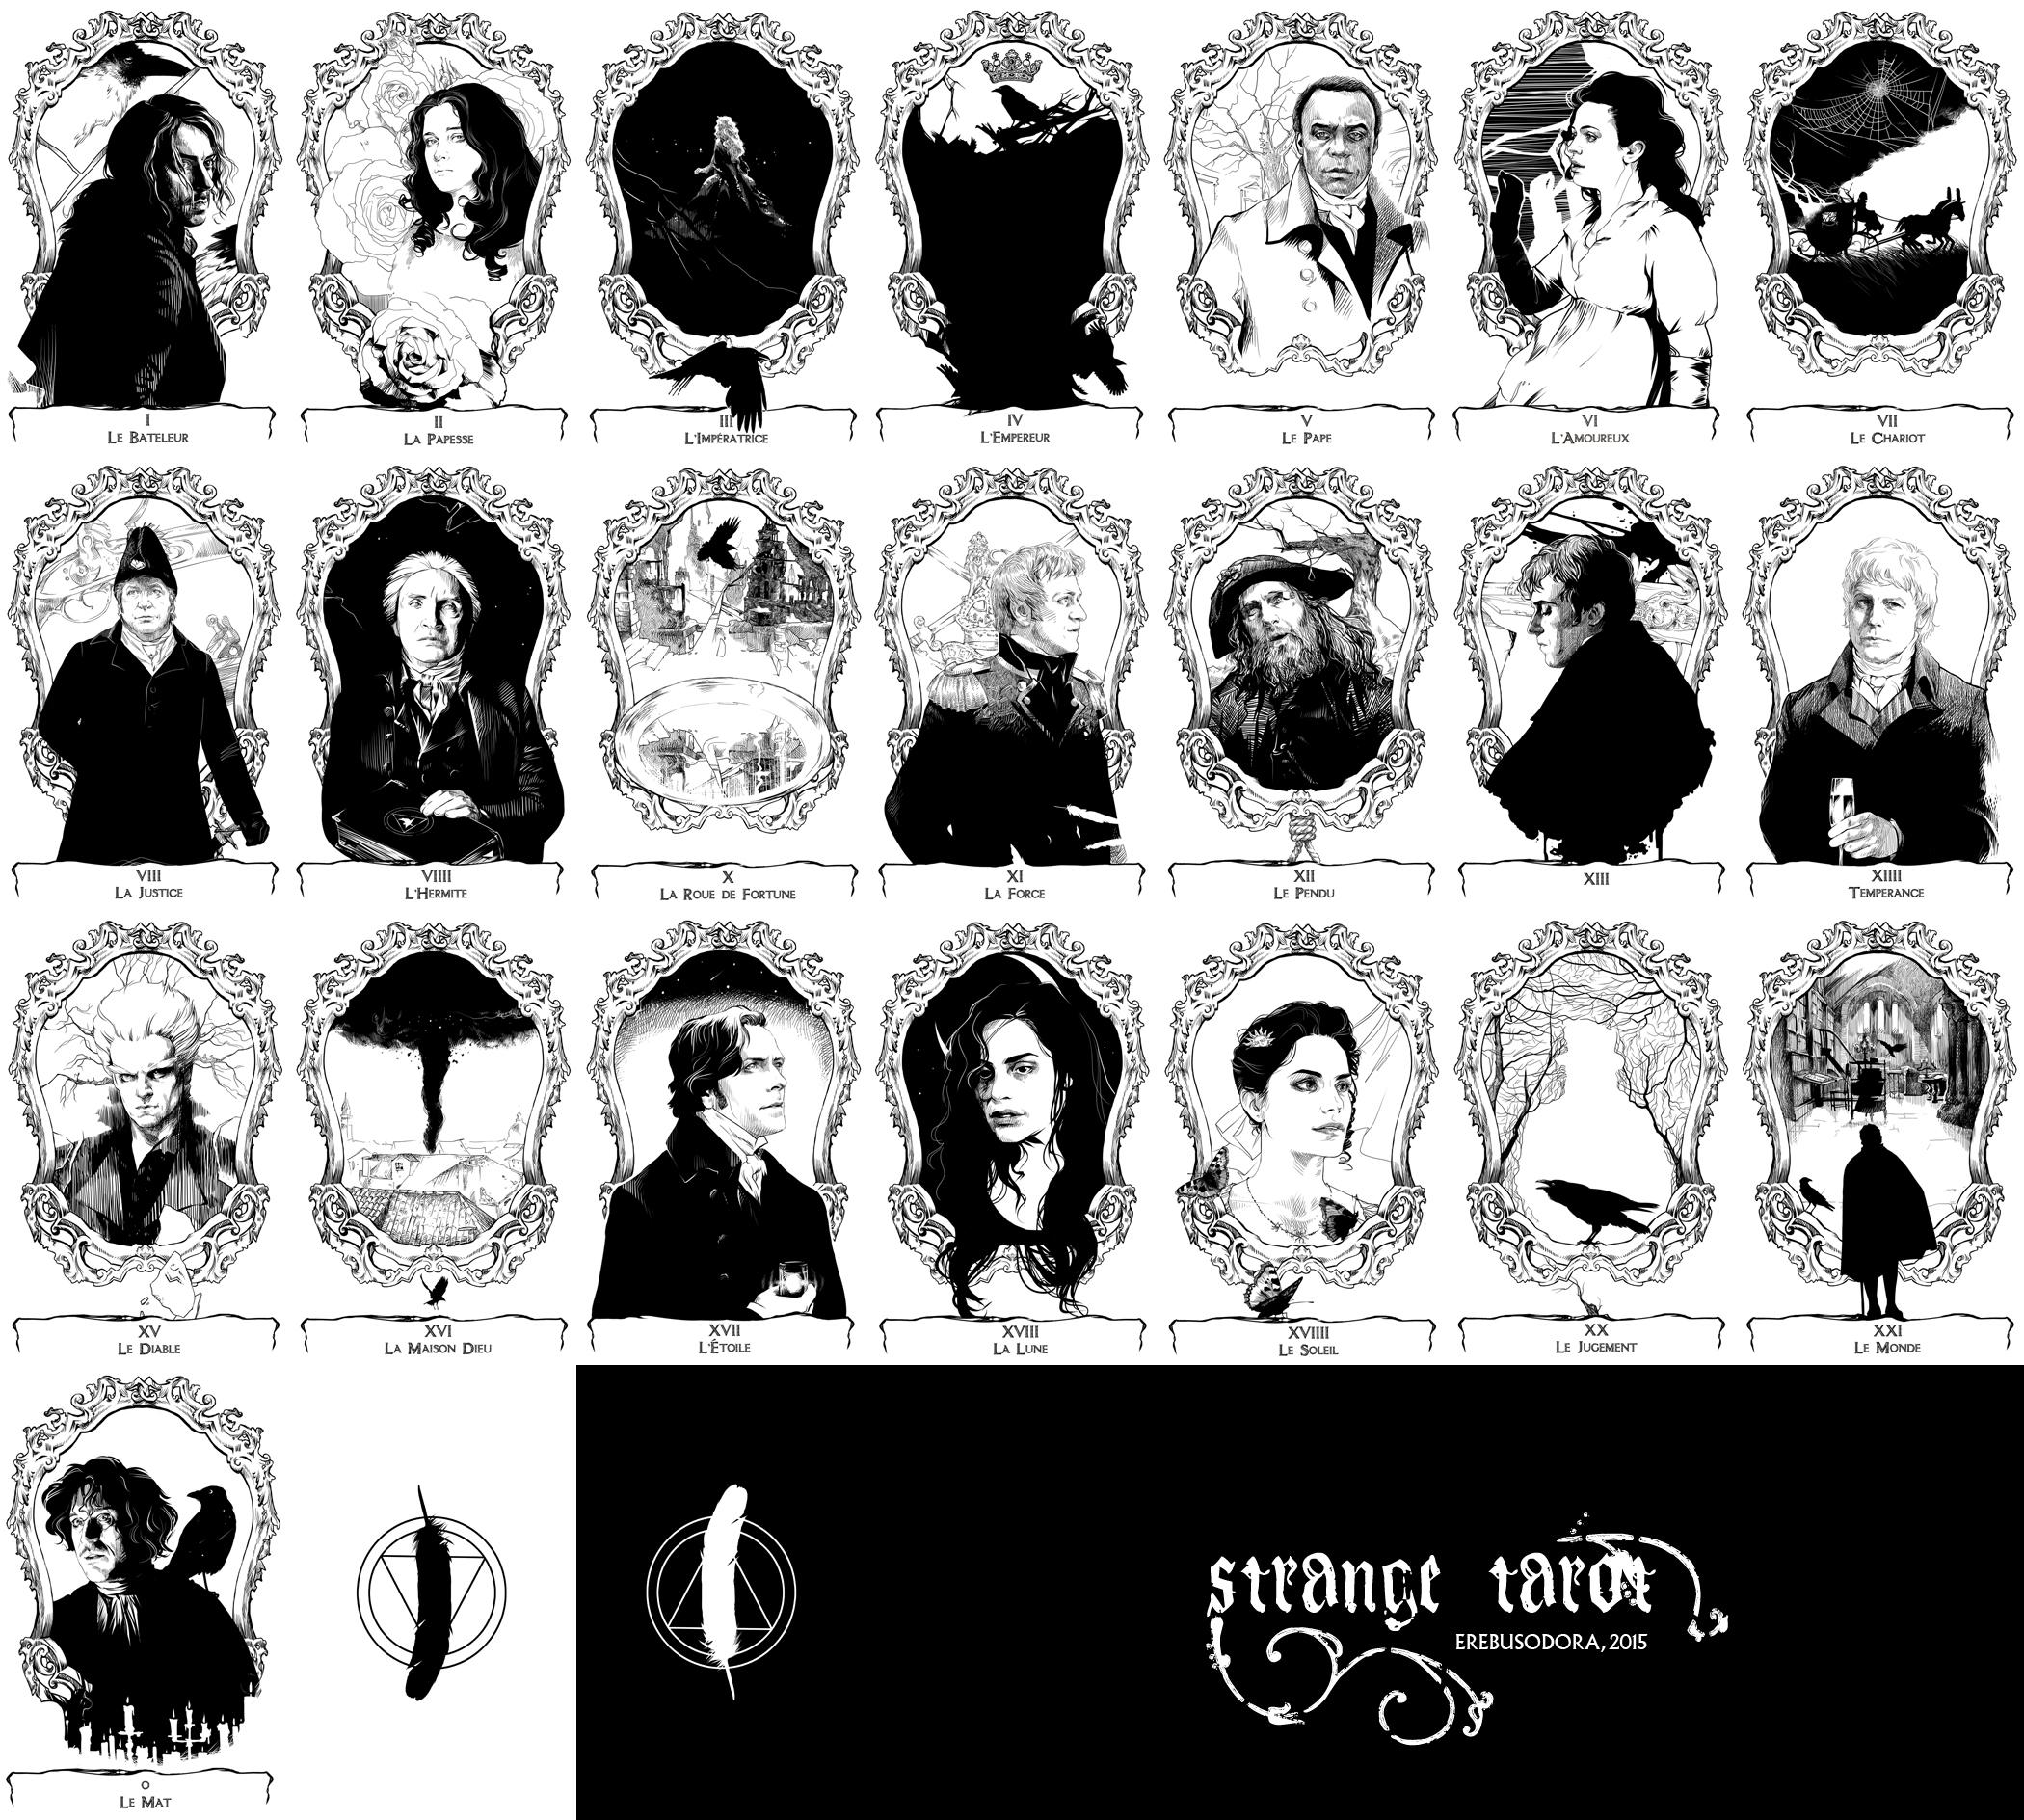 Strange Tarot :: Major Arcana by erebus-odora